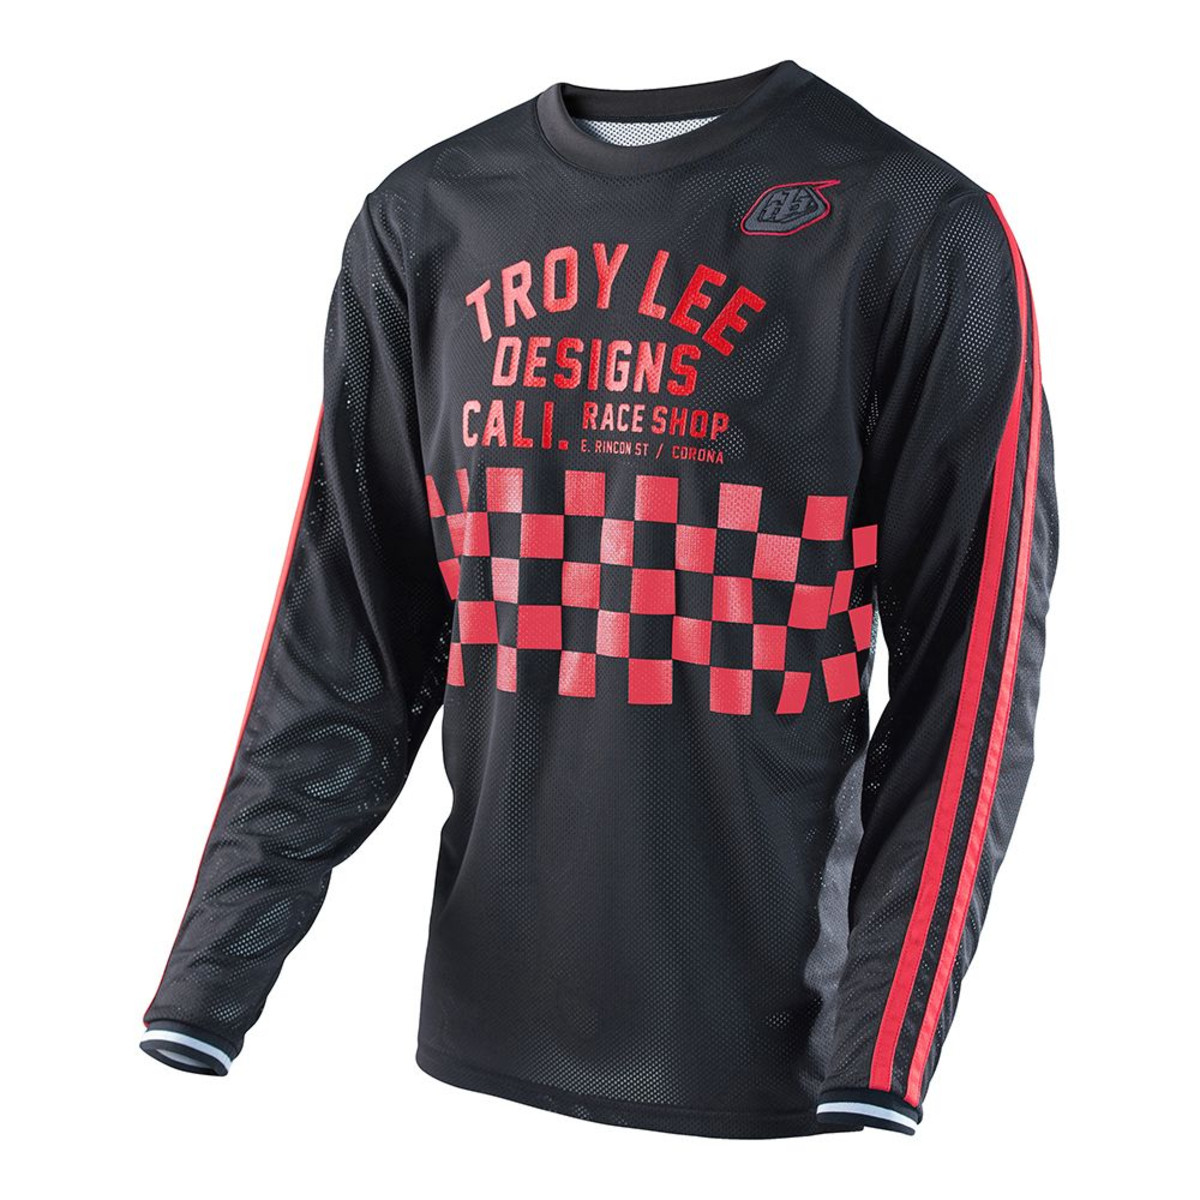 Troy Lee Designs Bike-Jersey Super Retro Retro Retro Schwarz/Rot 251e4a